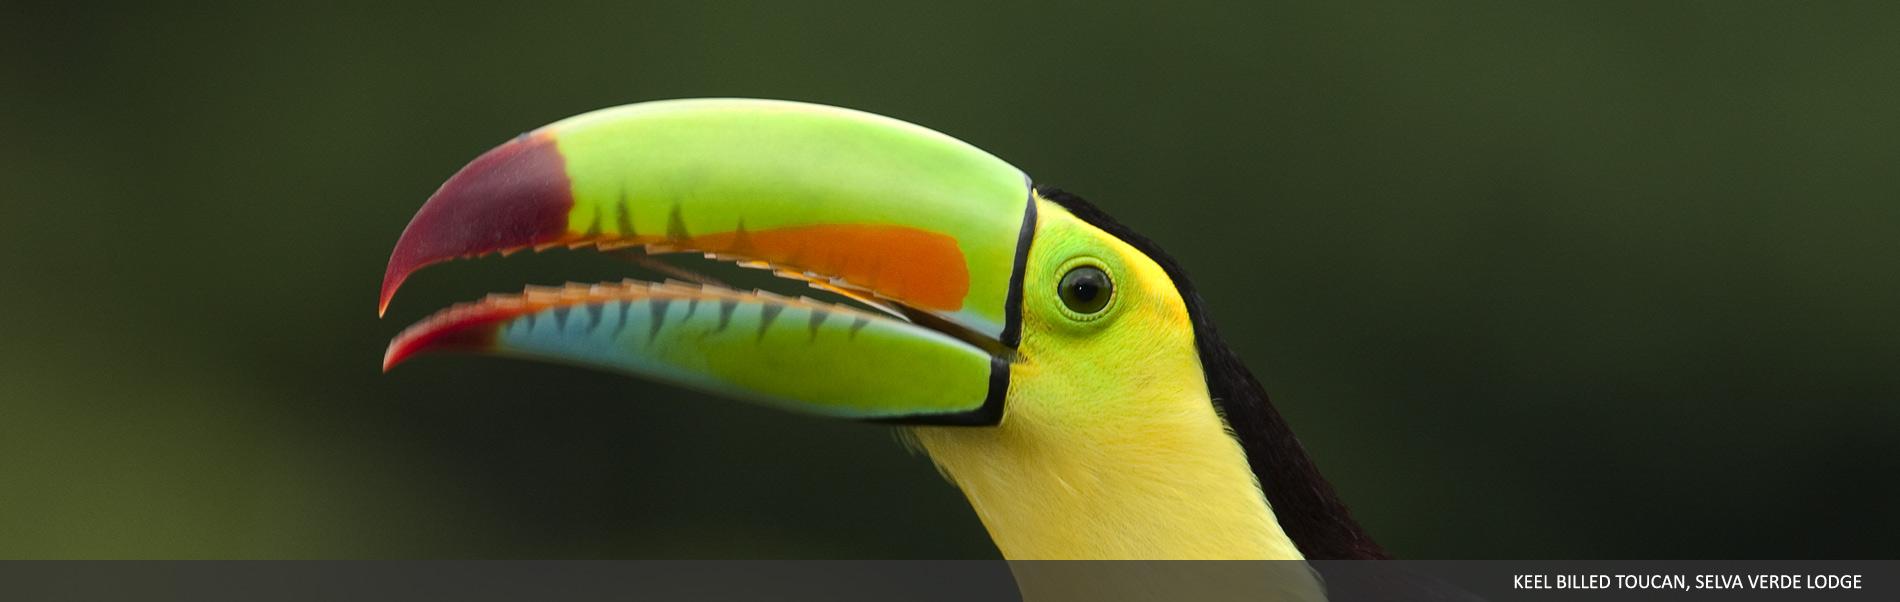 selvaverde-costarica-00.jpg